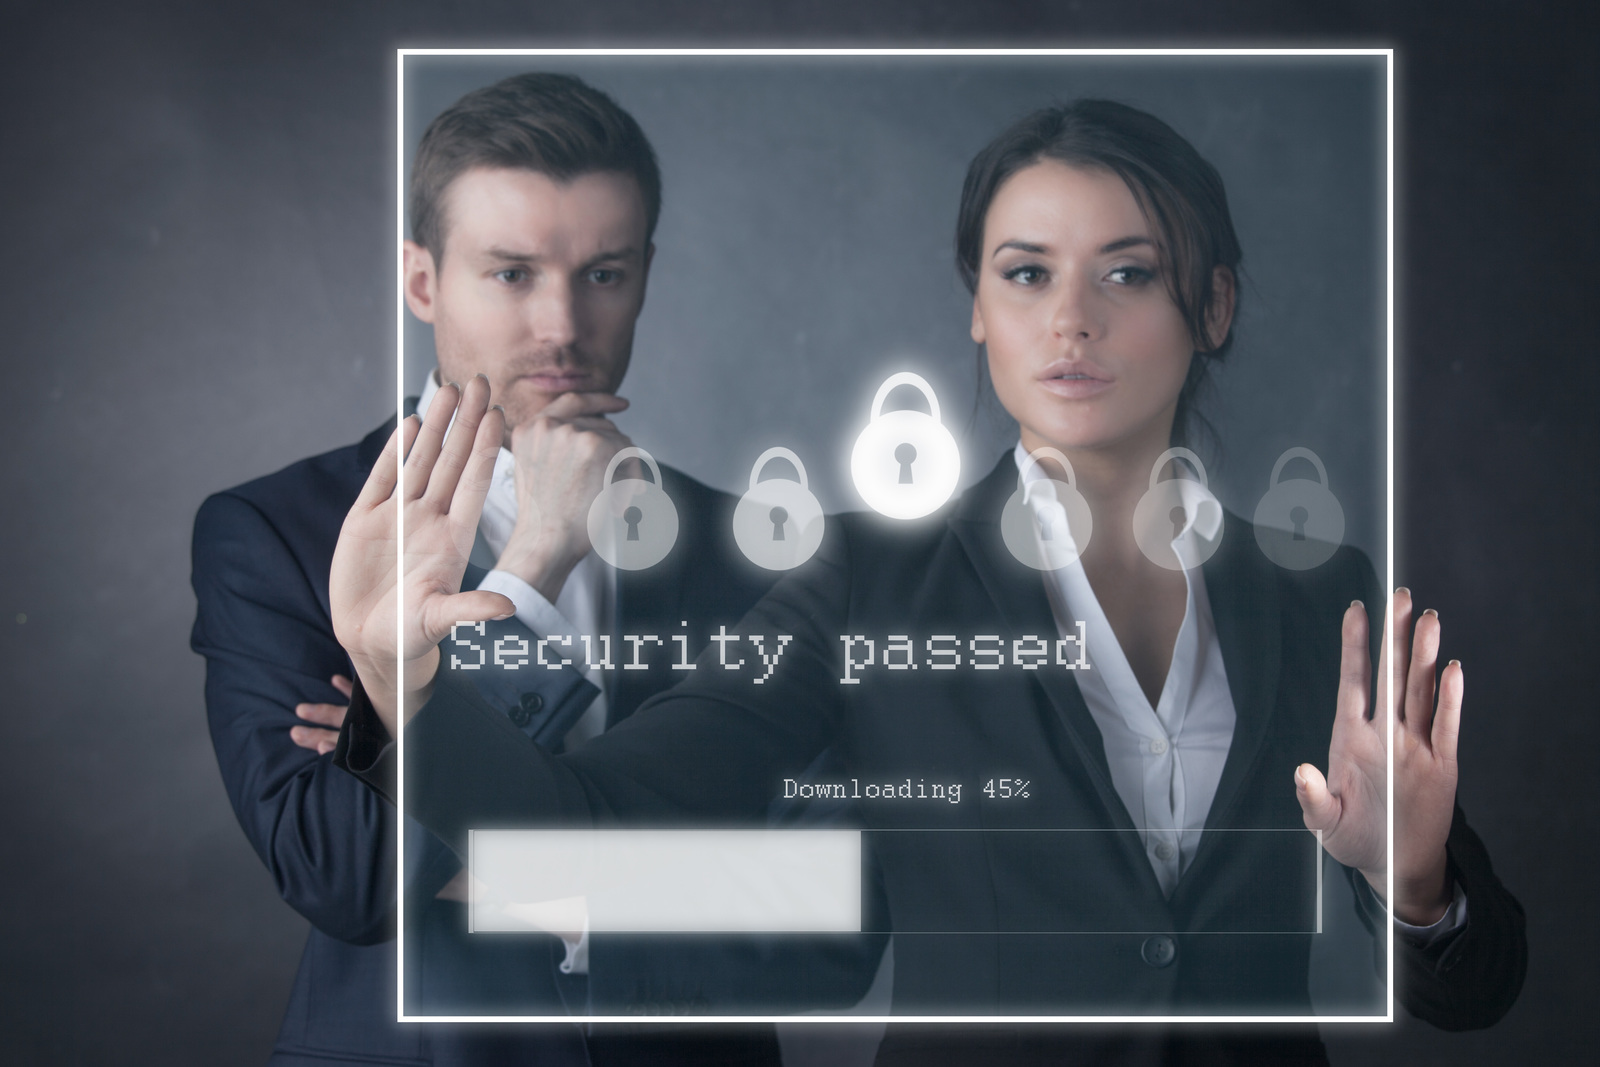 Individuals behind a password screen.